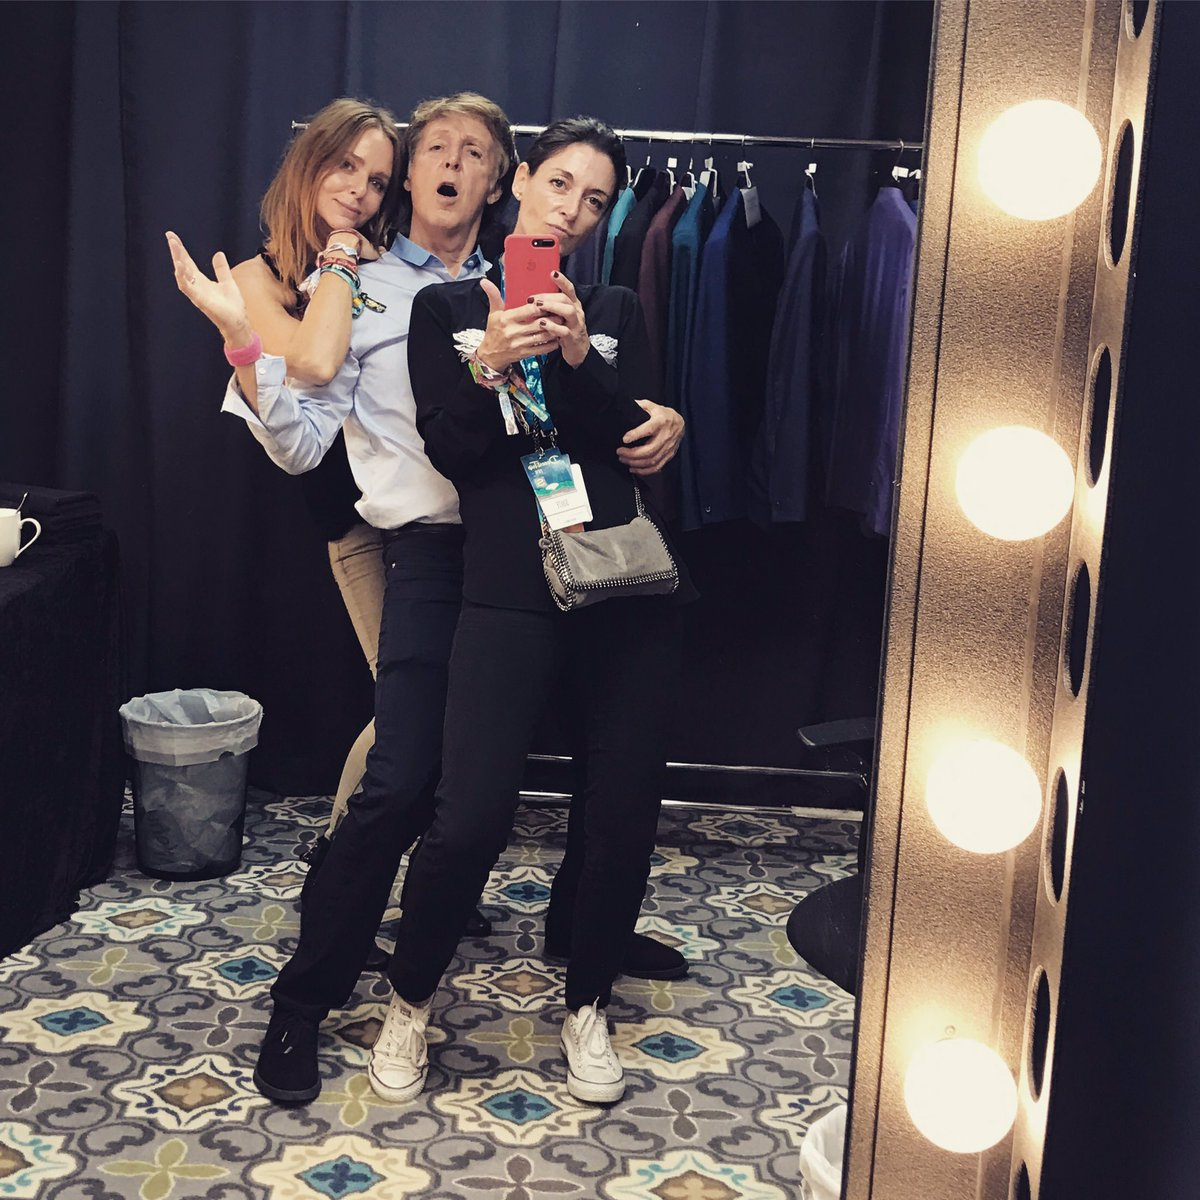 The Beatles Polska: Stella McCartney z Kate Hudson jak Thelma i Louise, czyli kobiecy wypad na festiwal Desert Trip